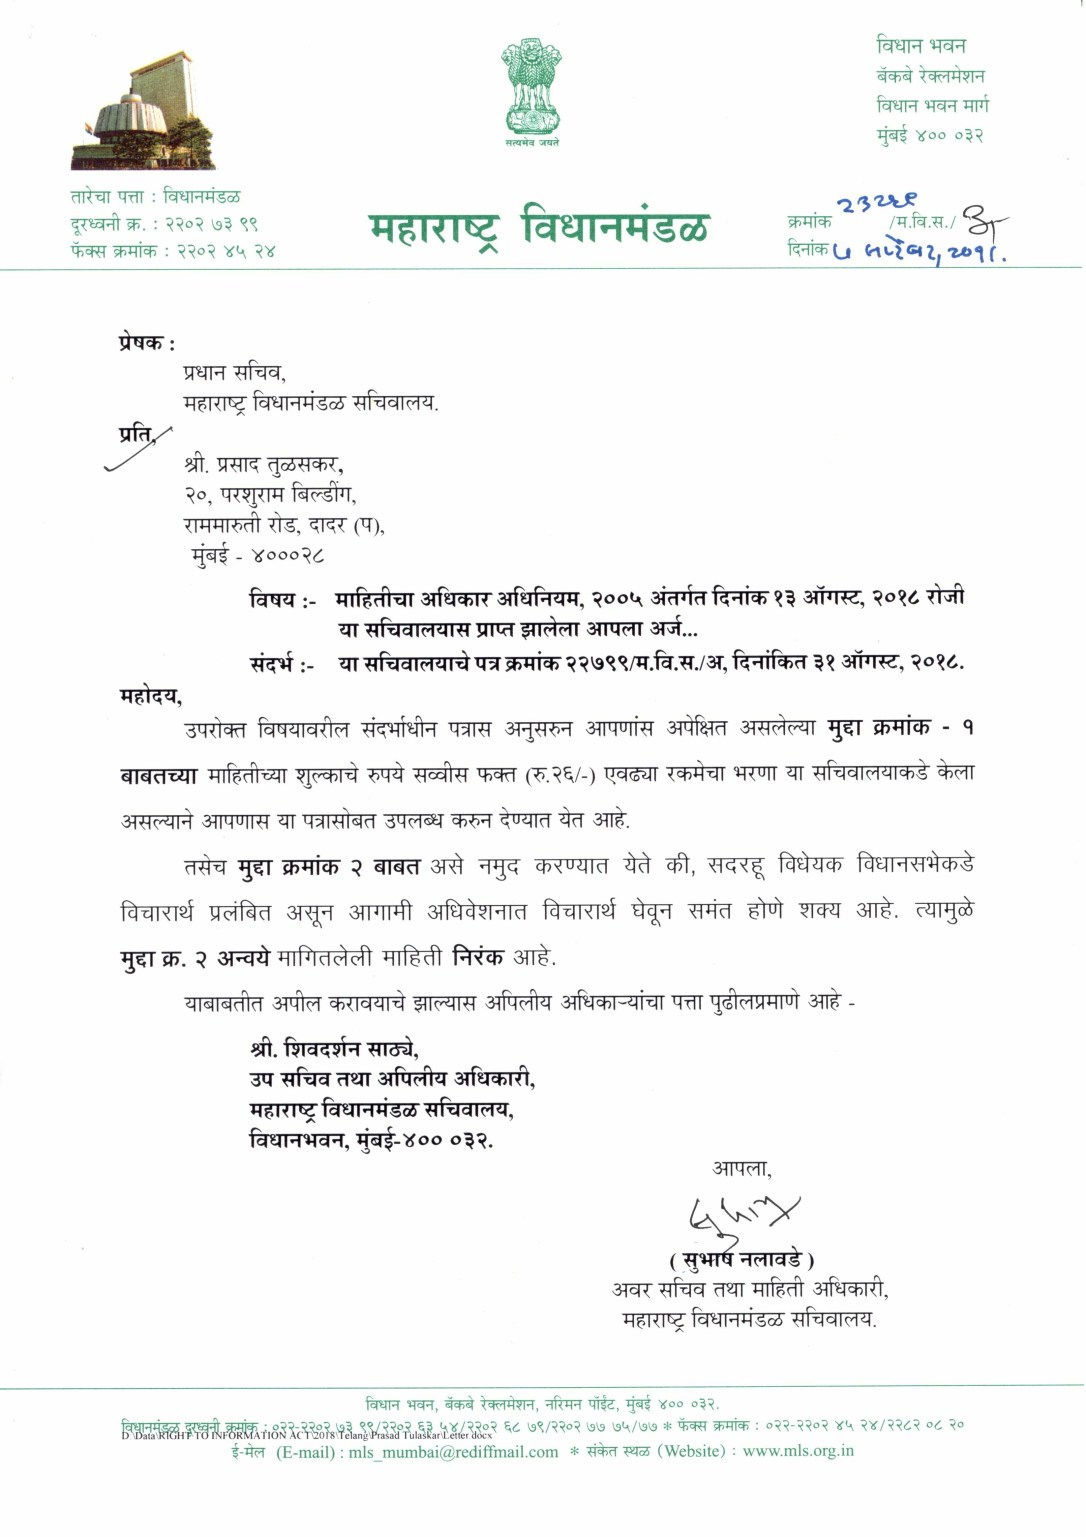 Maharashtra Educational Institutions Regulation of Fee Act 2011 Amendment Bill of 2018 RTI Reply